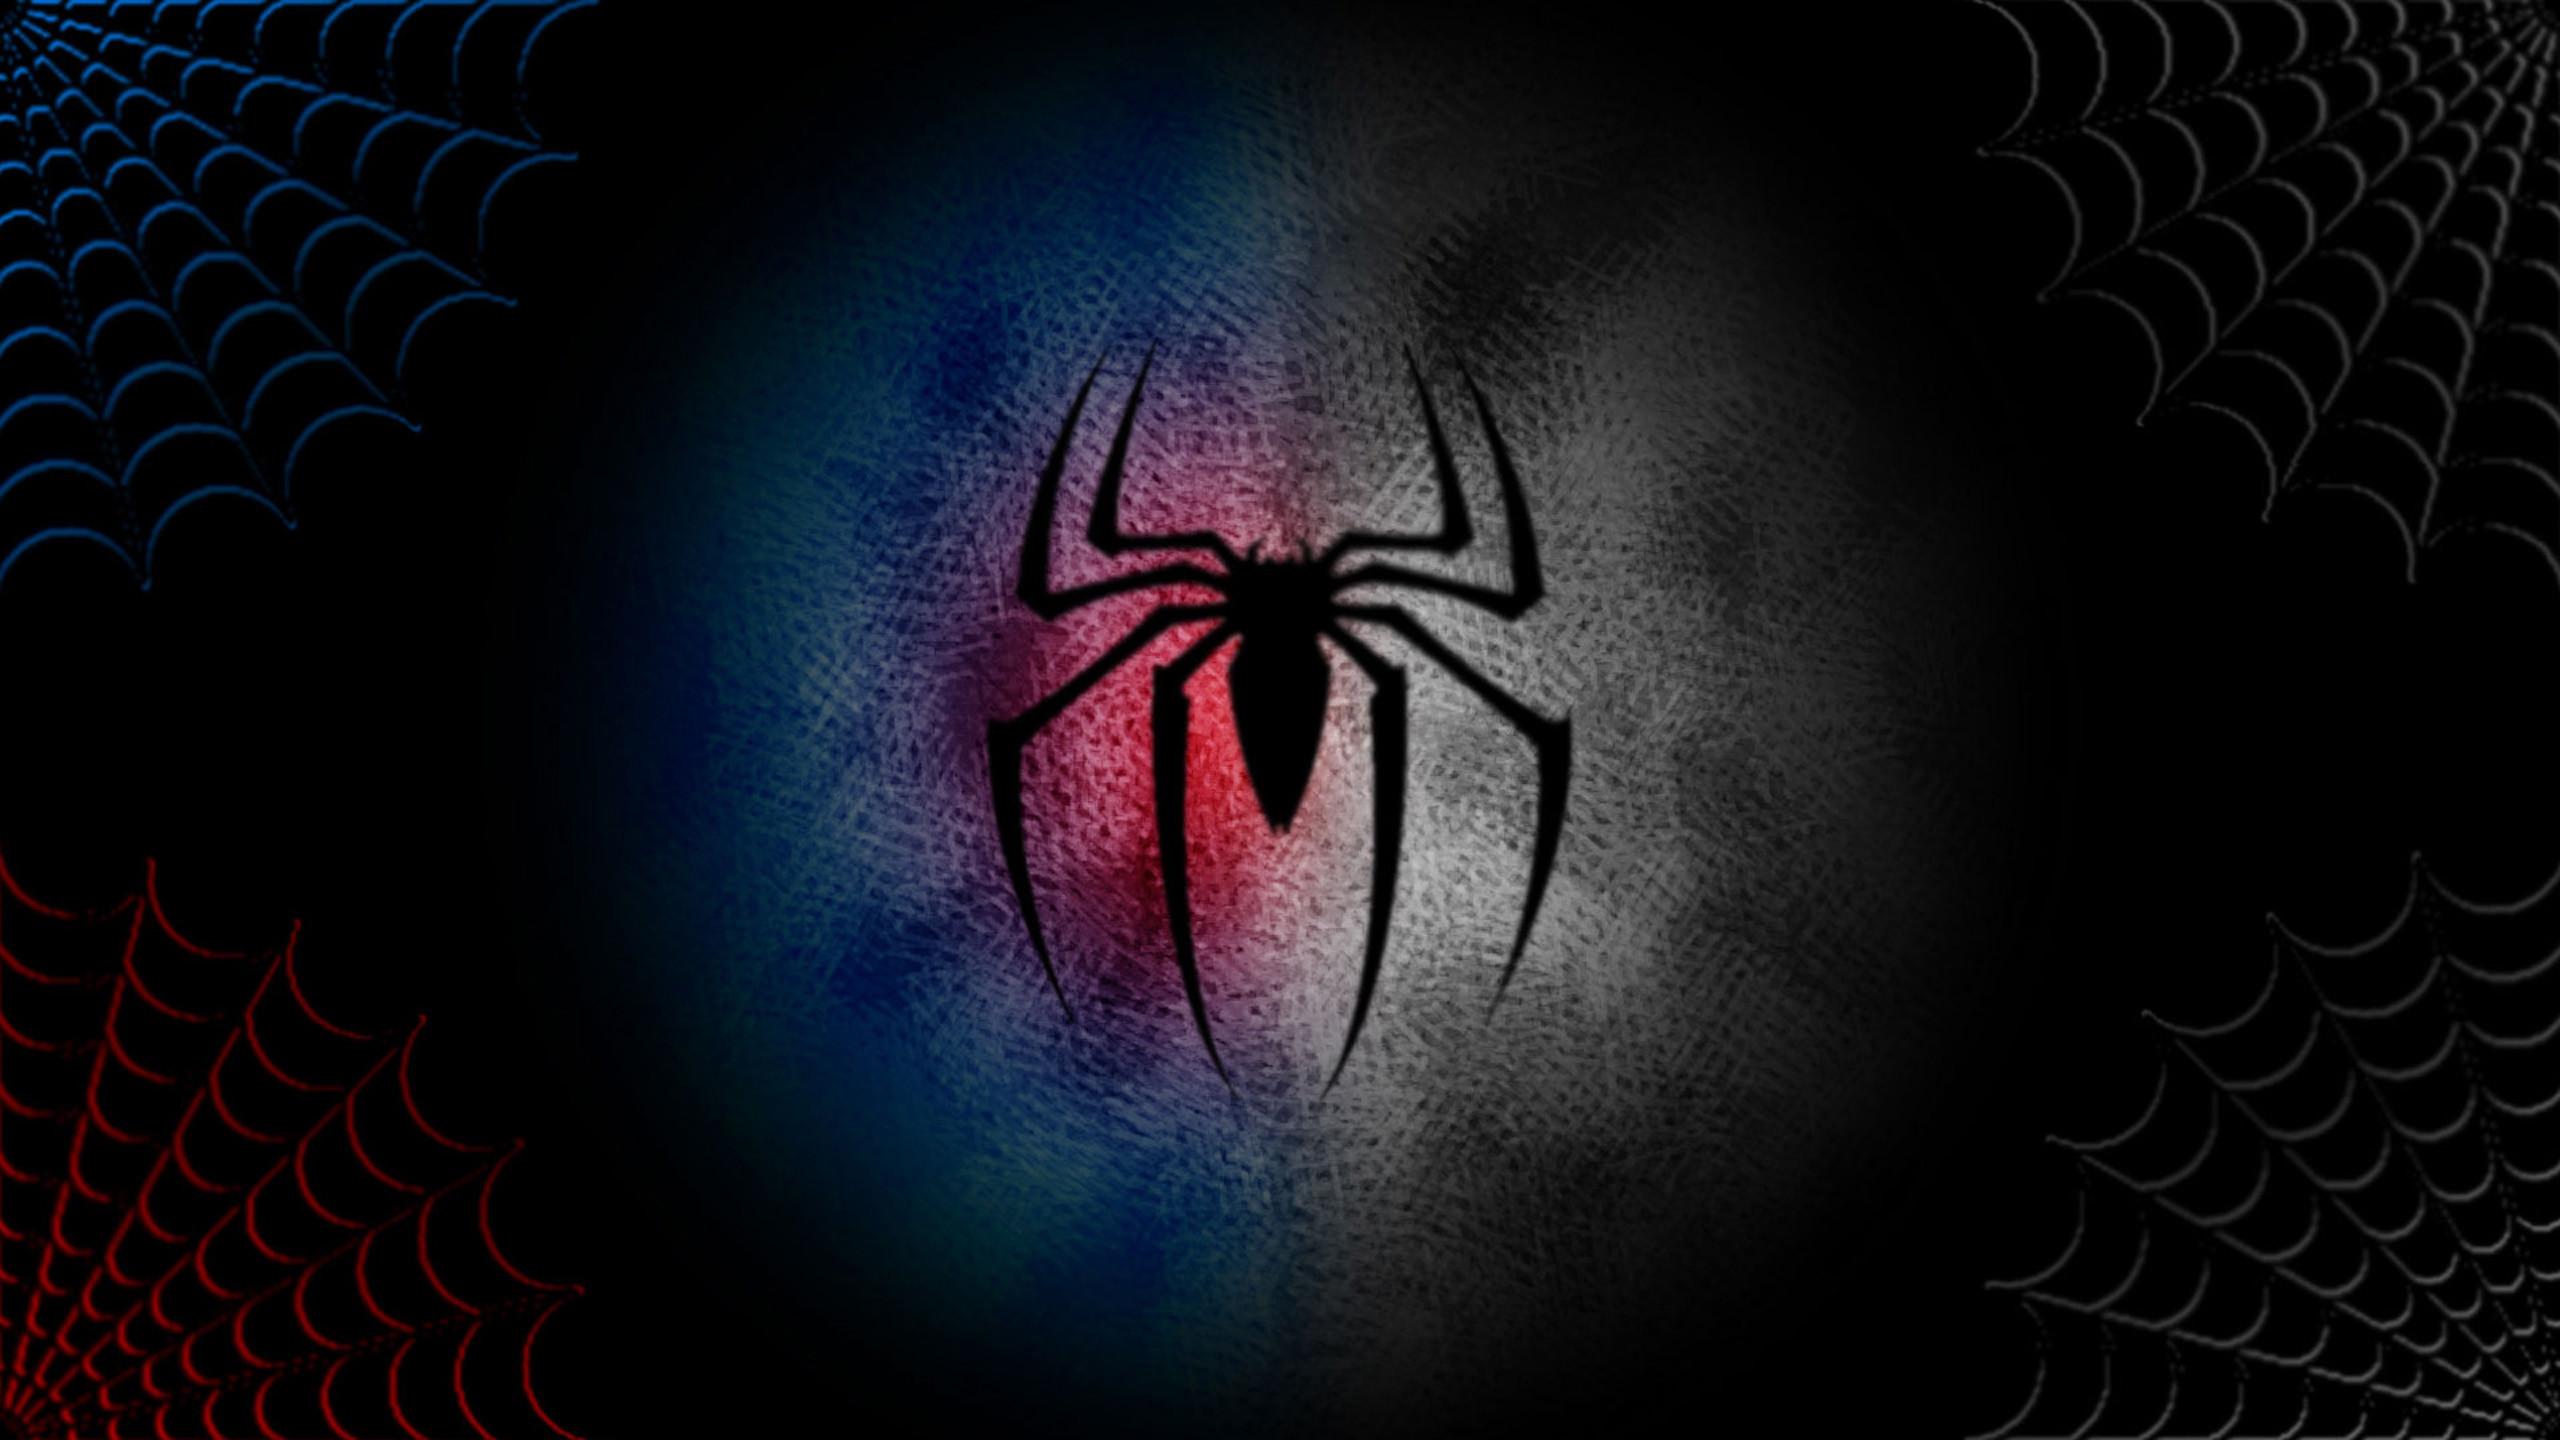 hd spider man desktop wallpapers 67 images